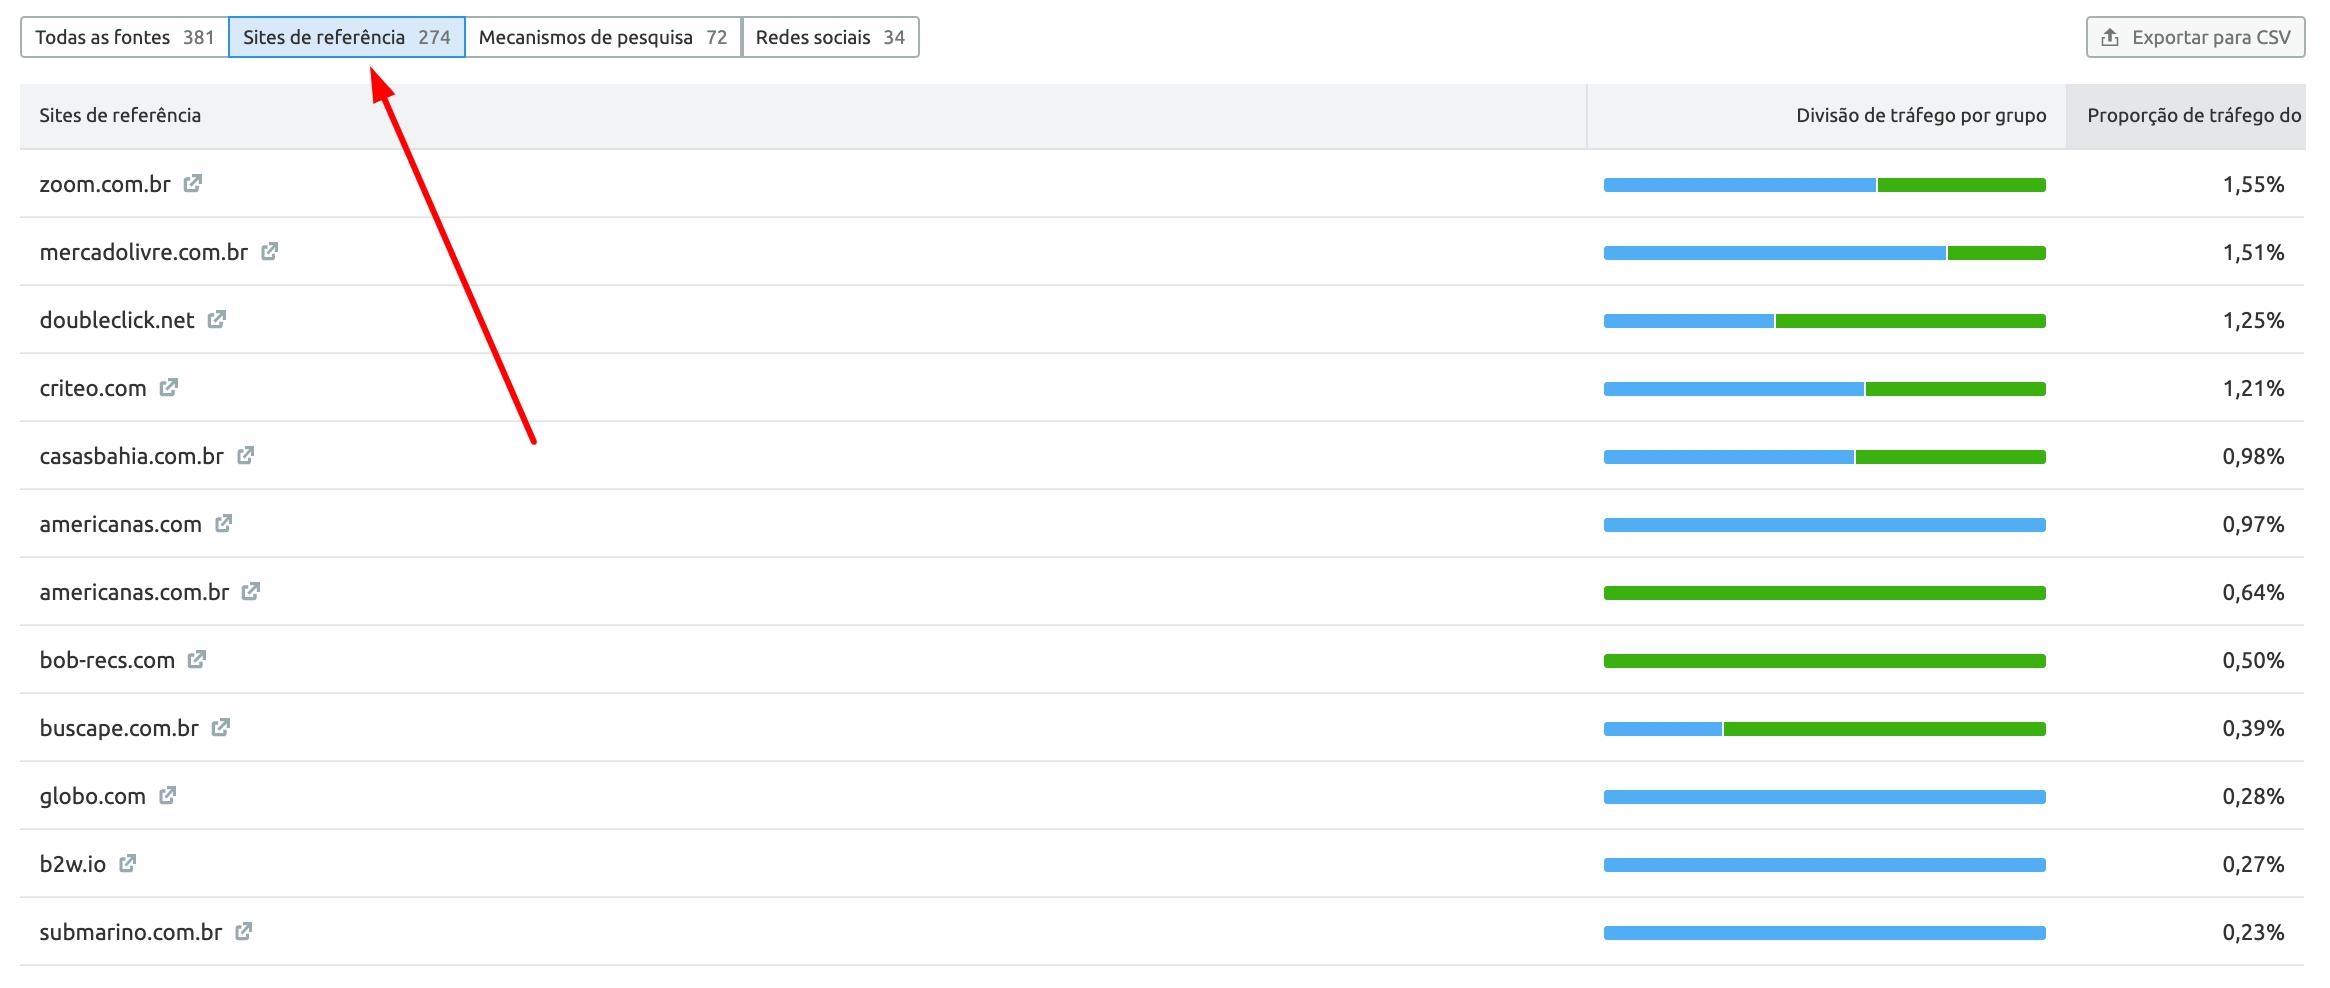 SEMrush's Traffic Analytics Jornada de tráfego detalhes